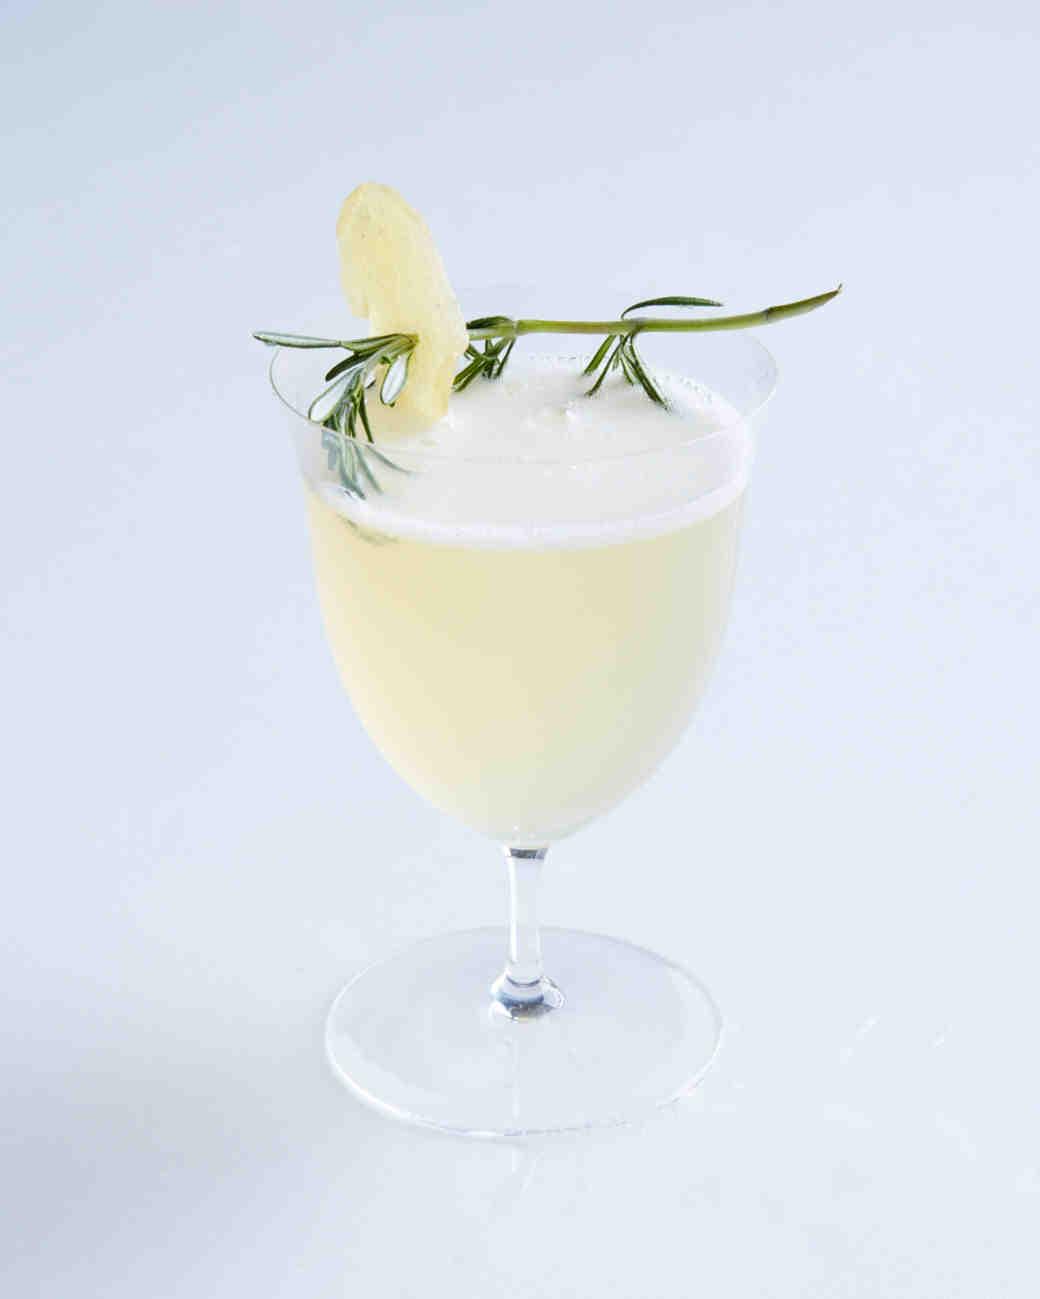 cocktail-pear-bellini-140-d111274-0814.jpg